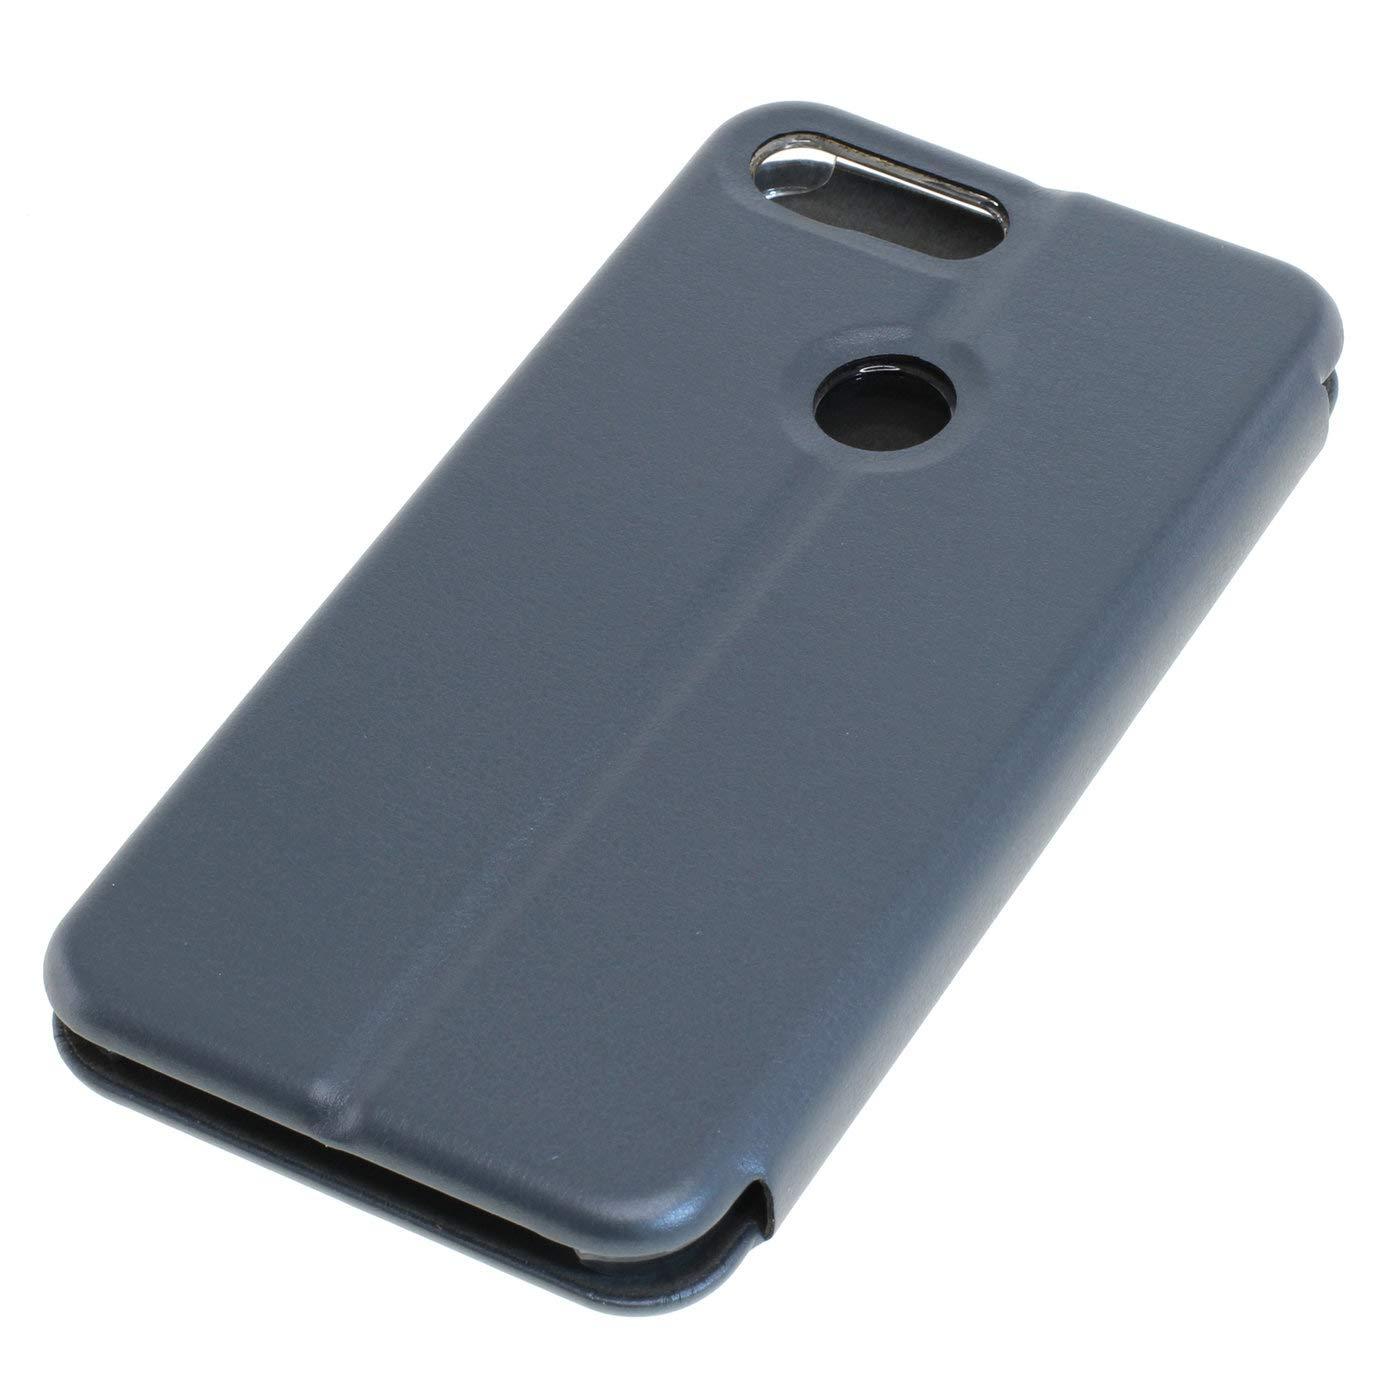 Gigaset Book Case - Funda Protectora para Smartphone GS195 (360 ...